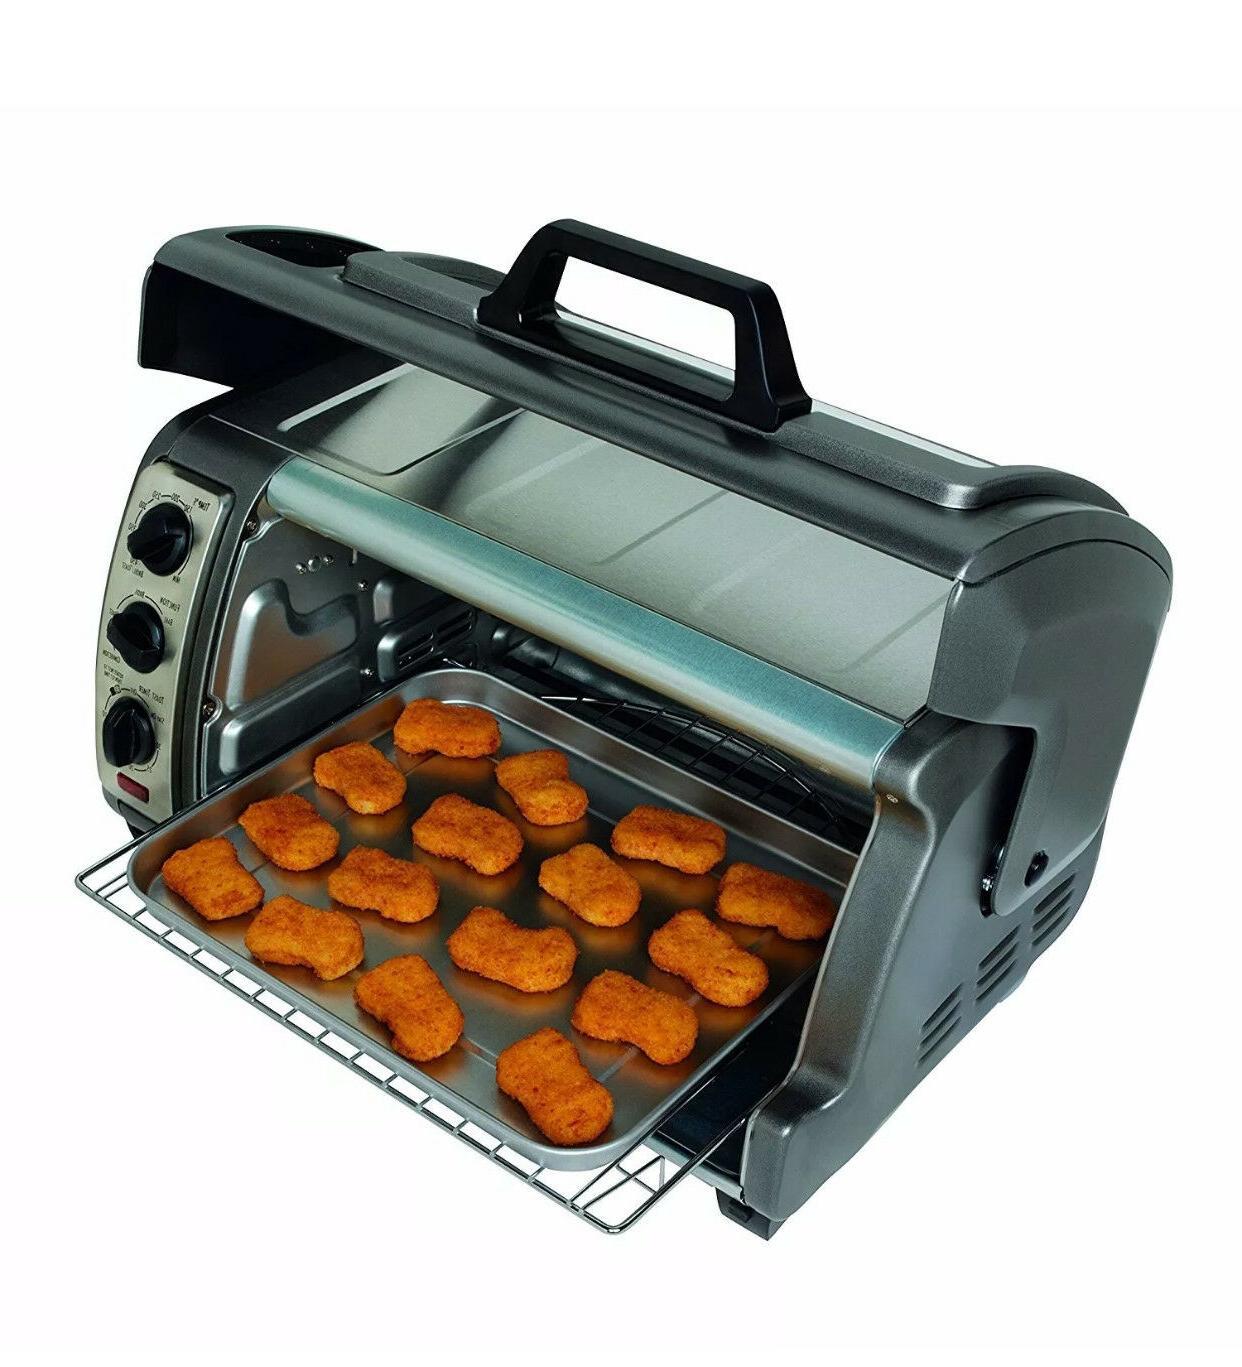 Hamilton Beach reach Toaster with RollTop Door